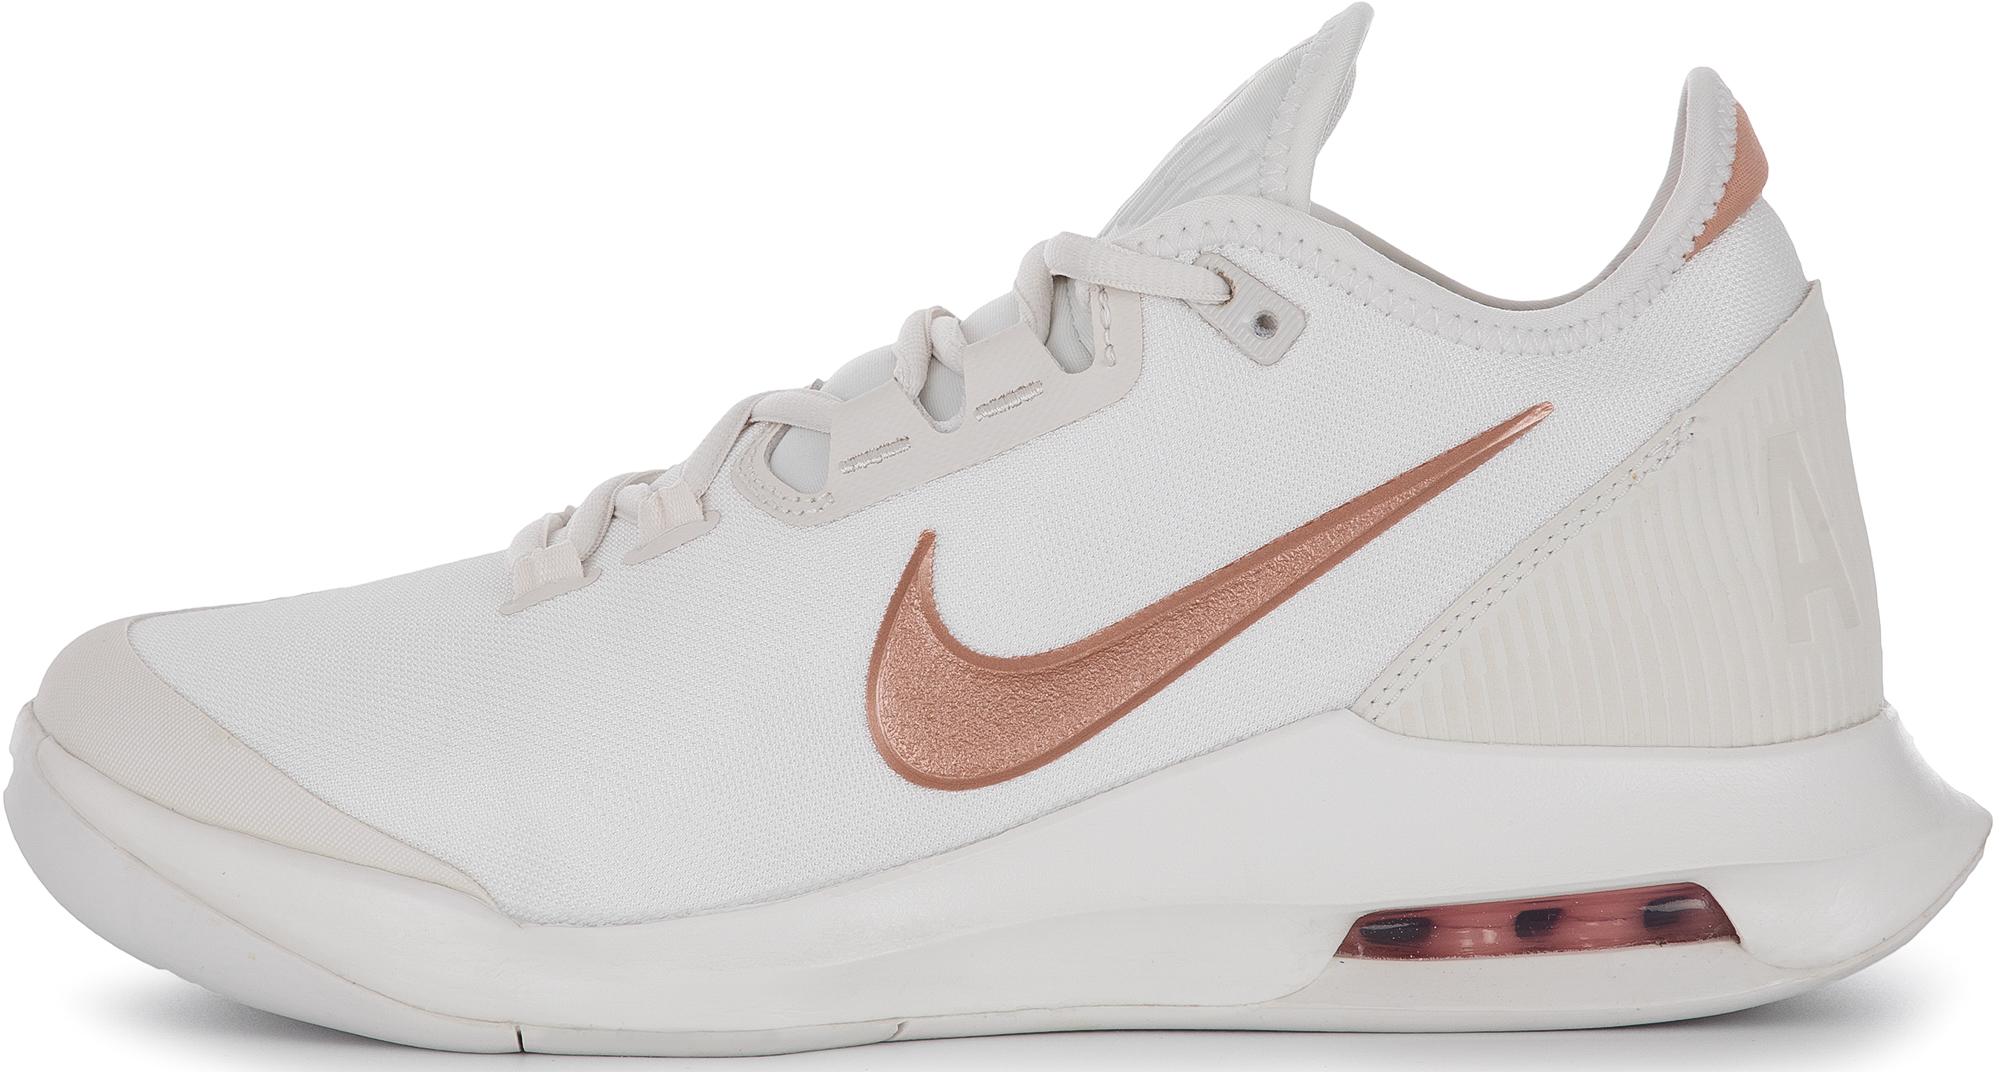 Nike Кроссовки женские Nike Air Max Wildcard Hc, размер 39,5